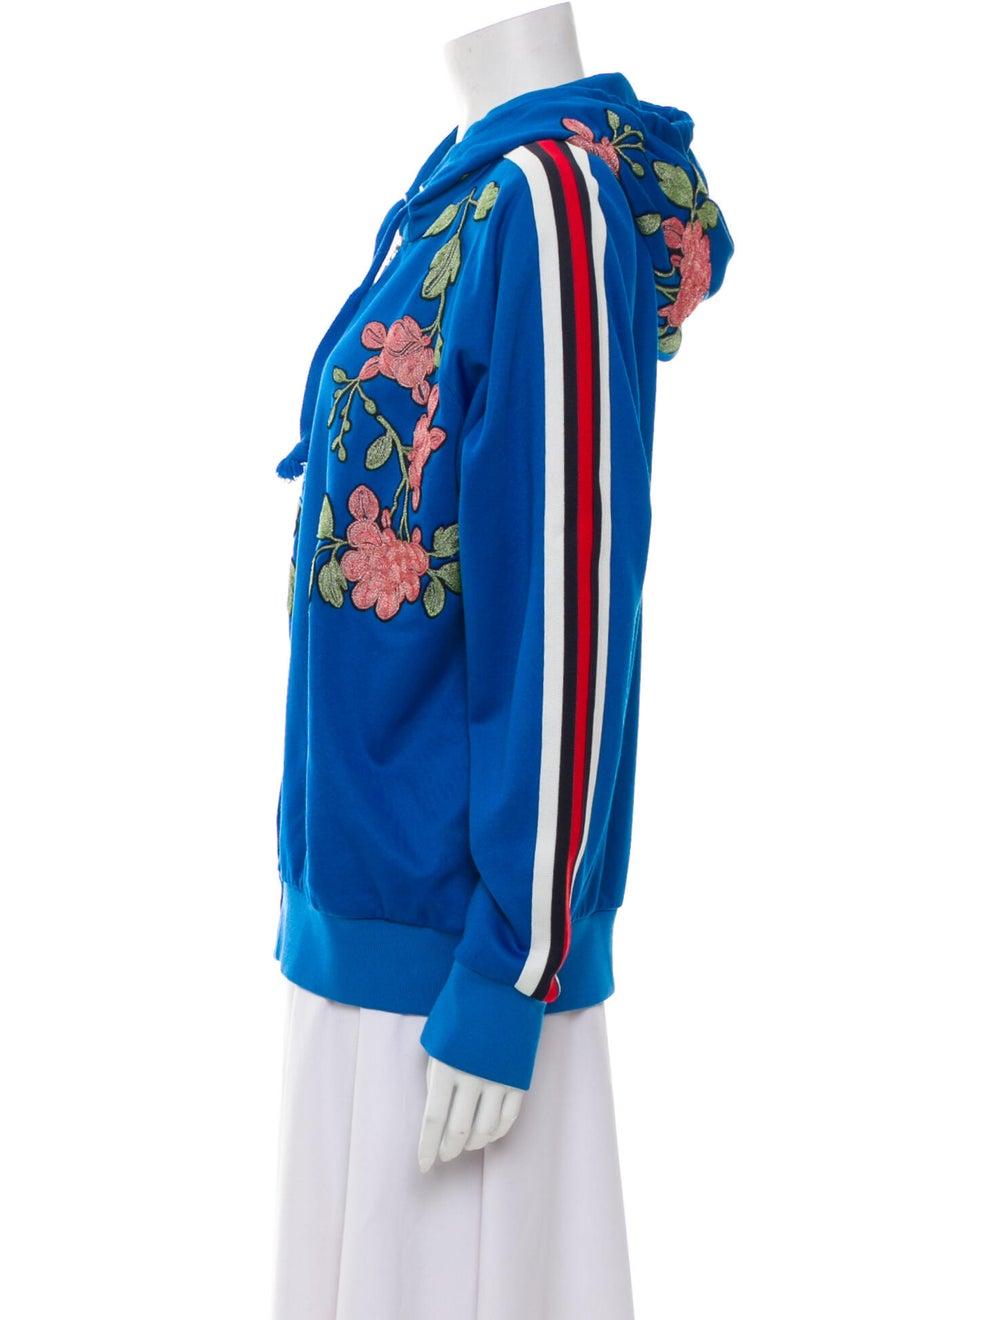 Gucci 2017 Floral Print Sweatshirt Blue - image 2